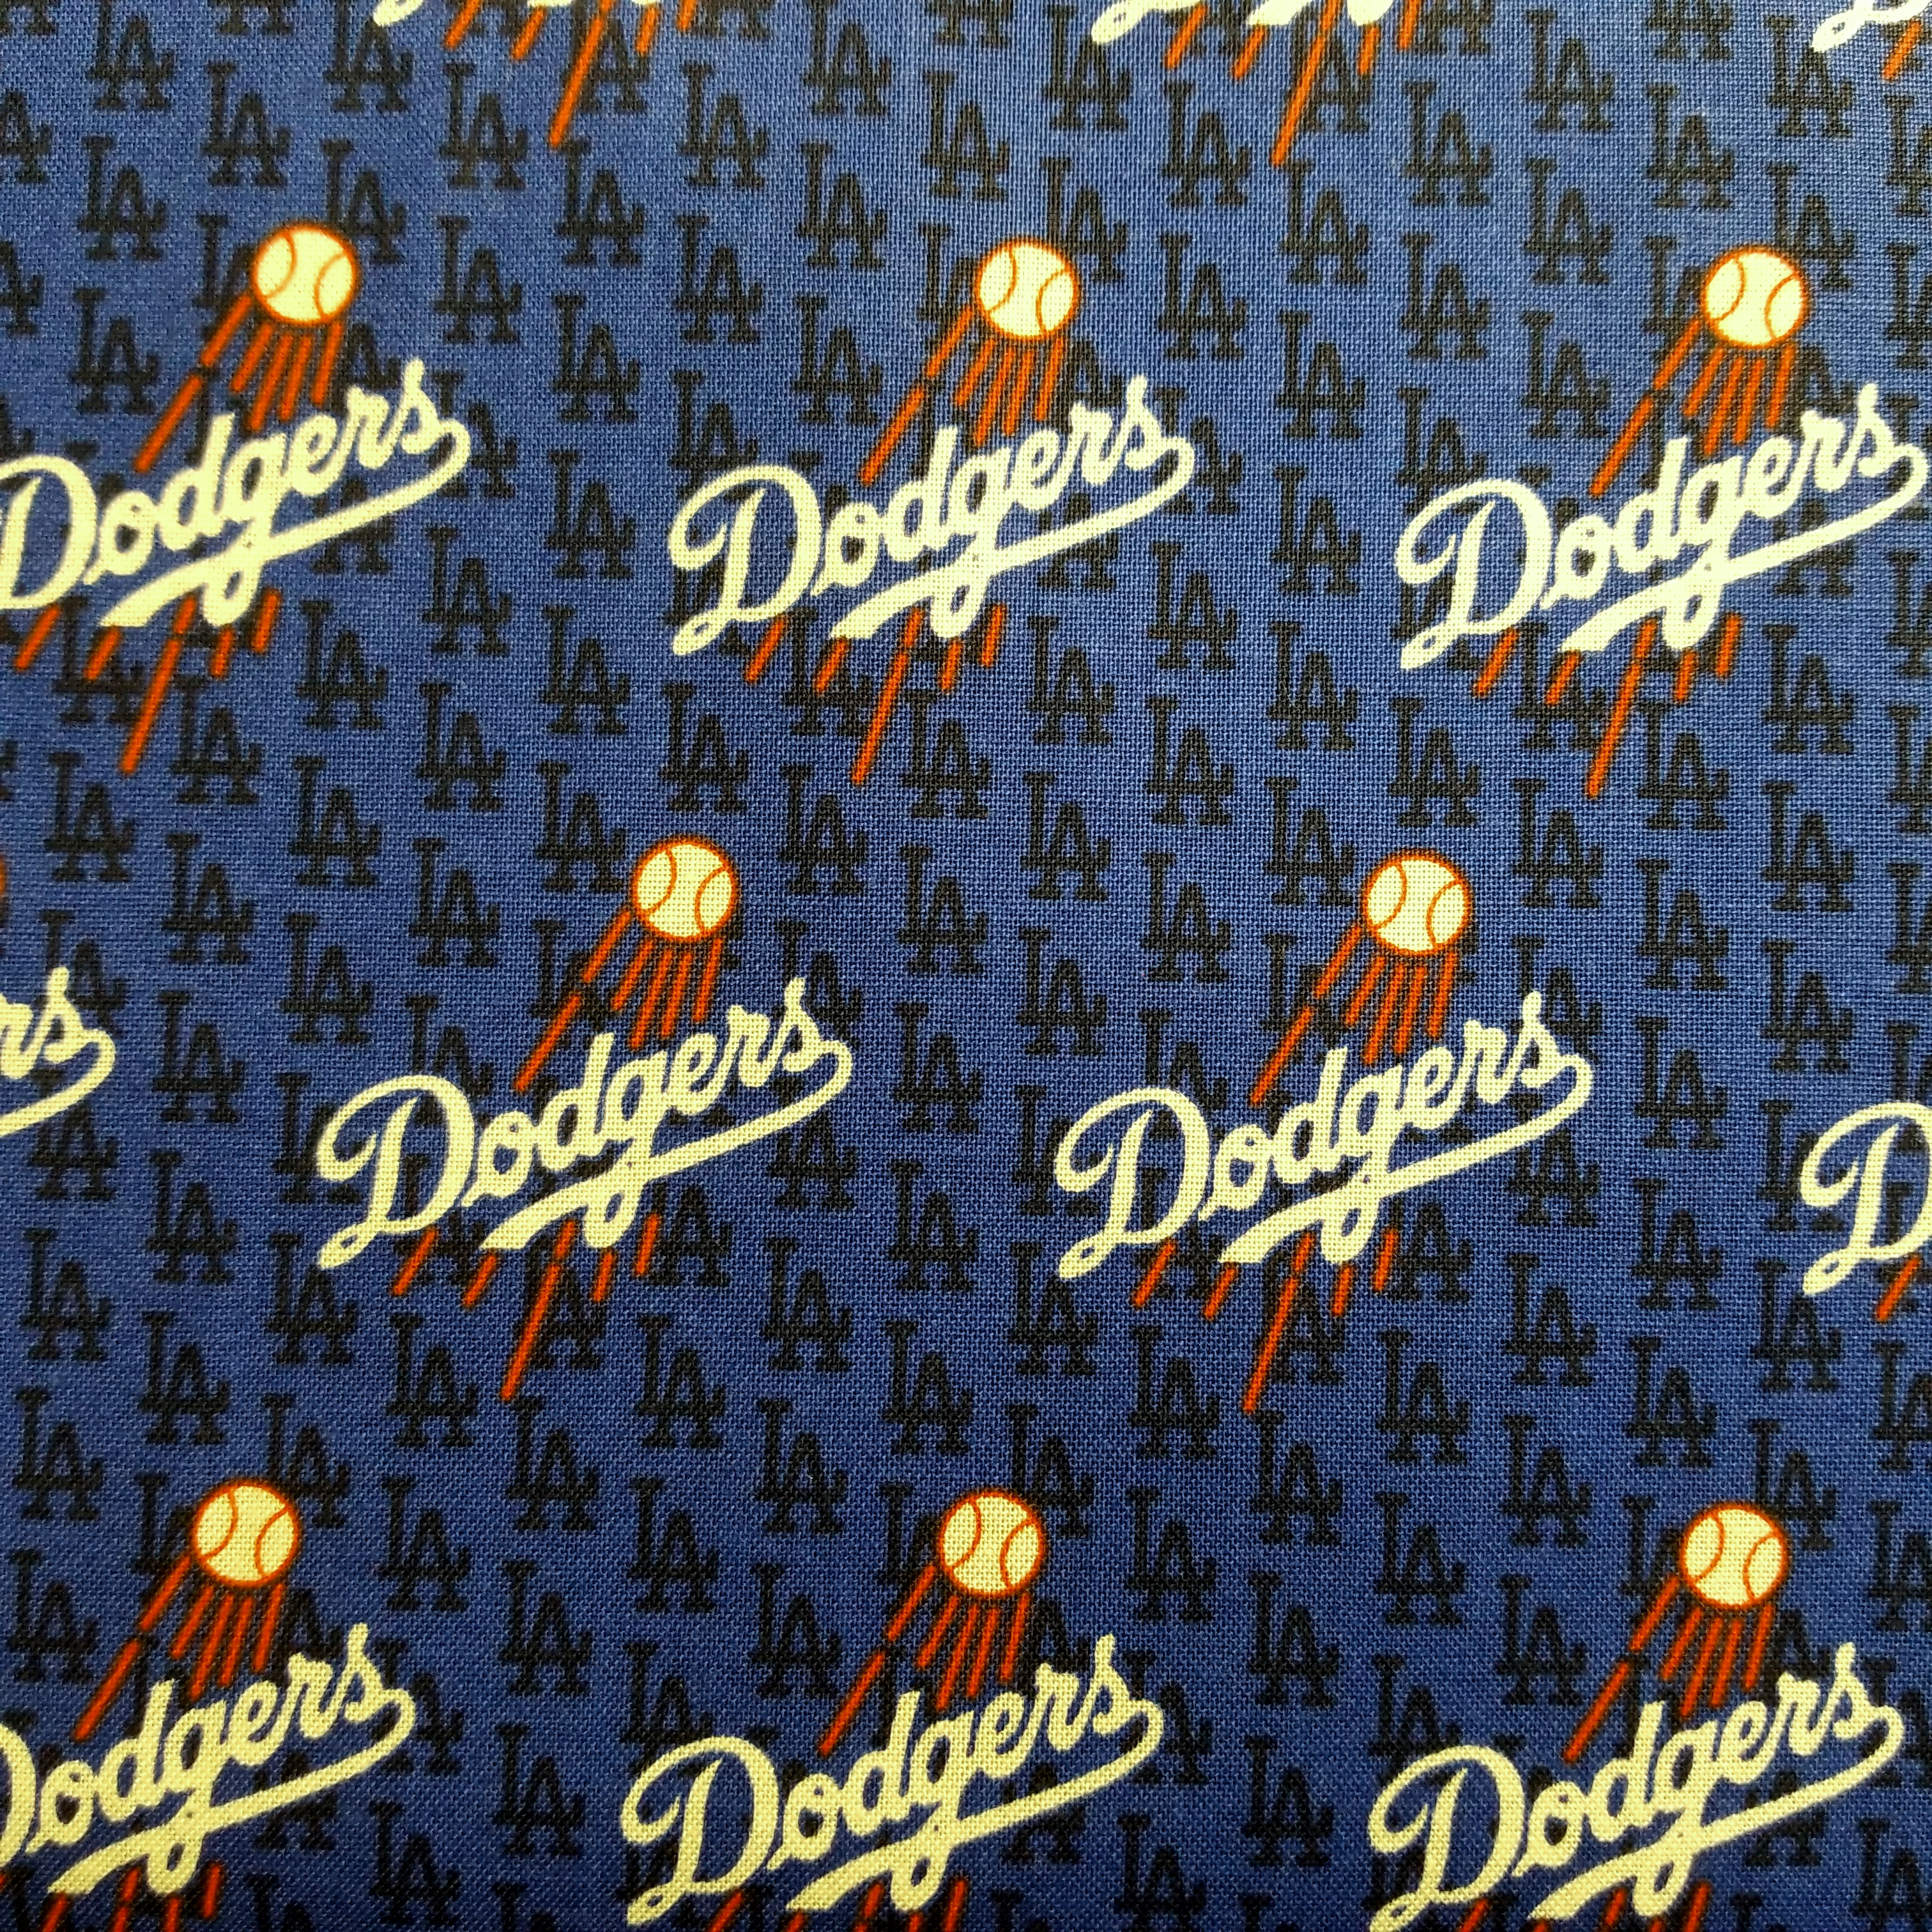 Team LA Dodgers